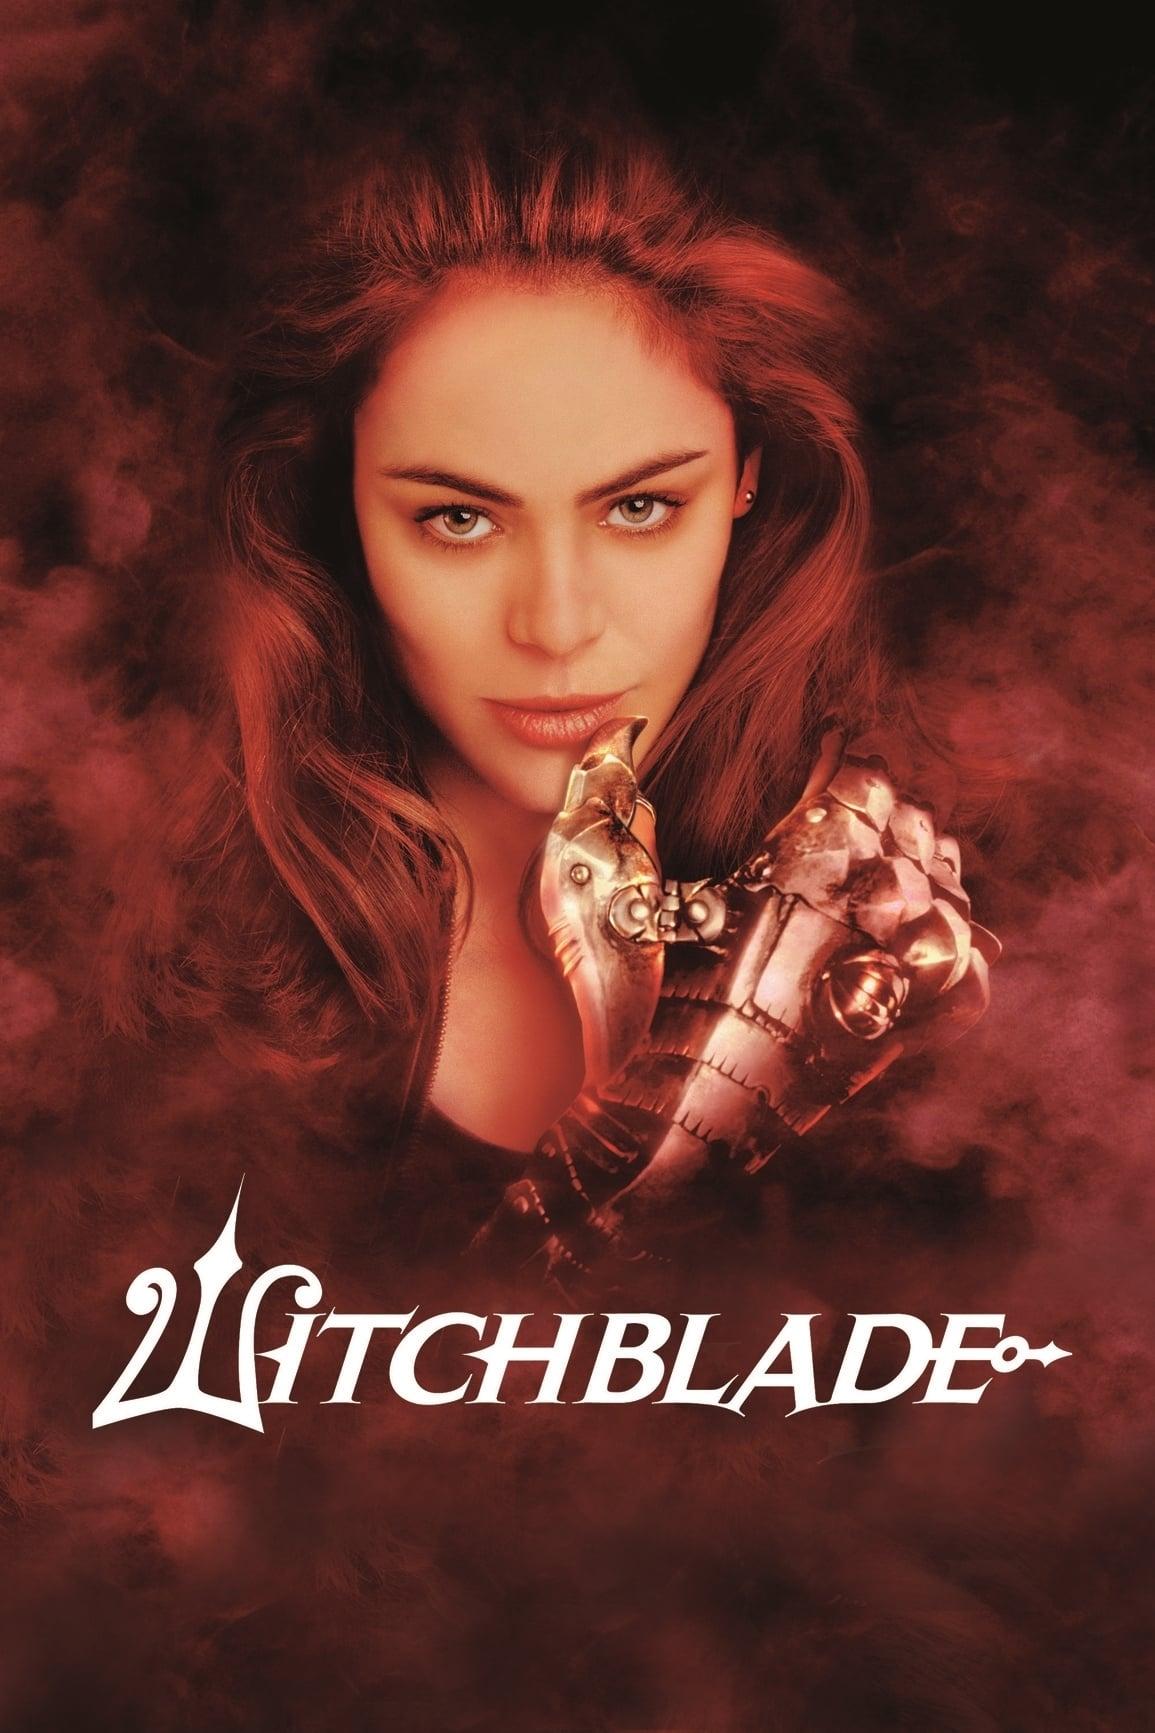 Witchblade (TV Series 2001-2002) - IMDb